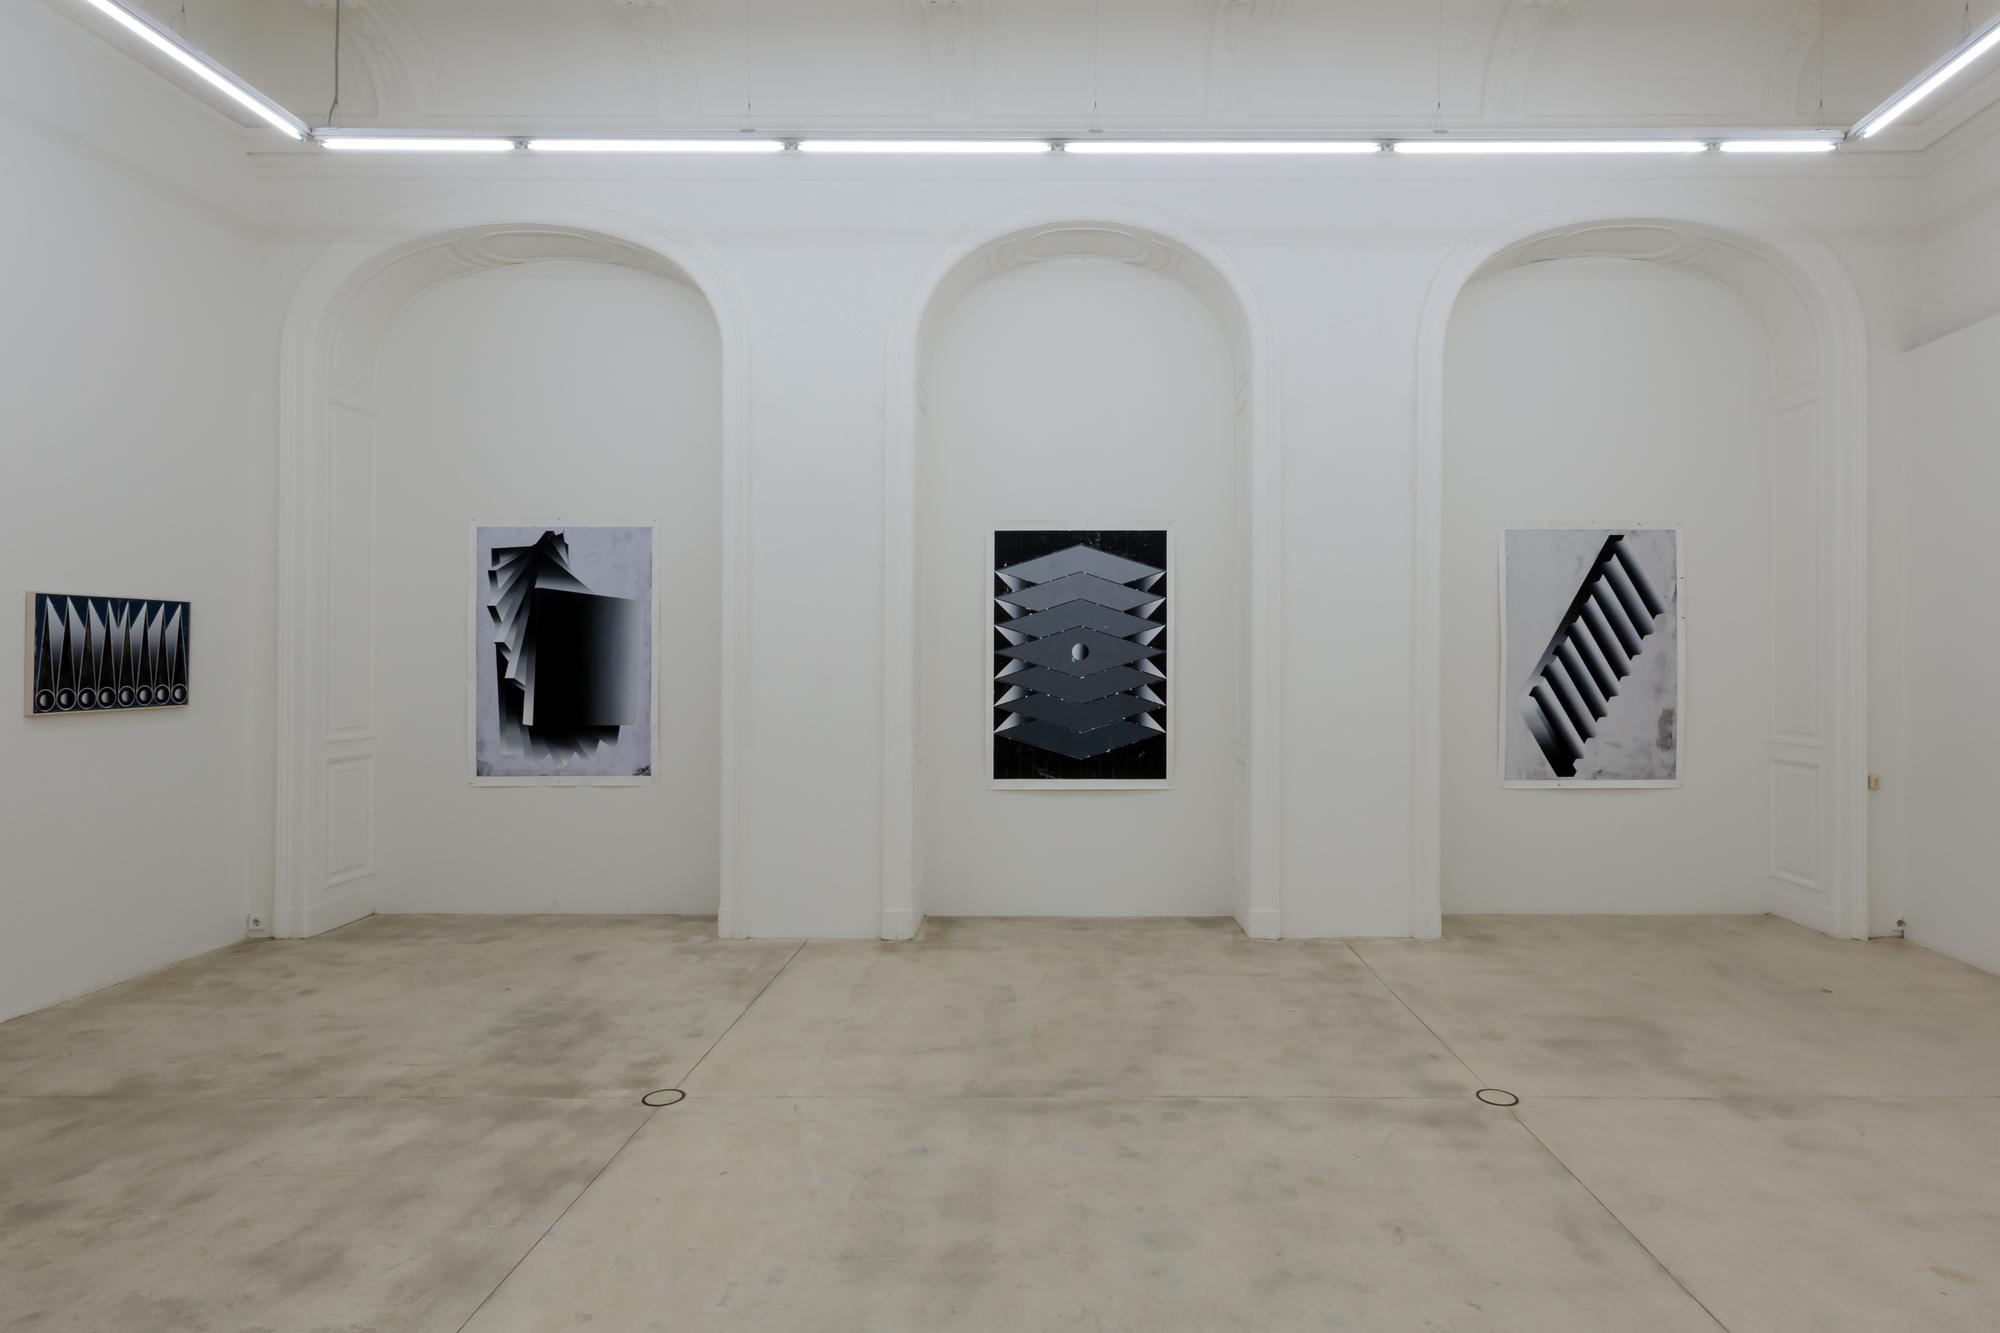 Vladimir Houdek art exhibition at gallery Krinzinger